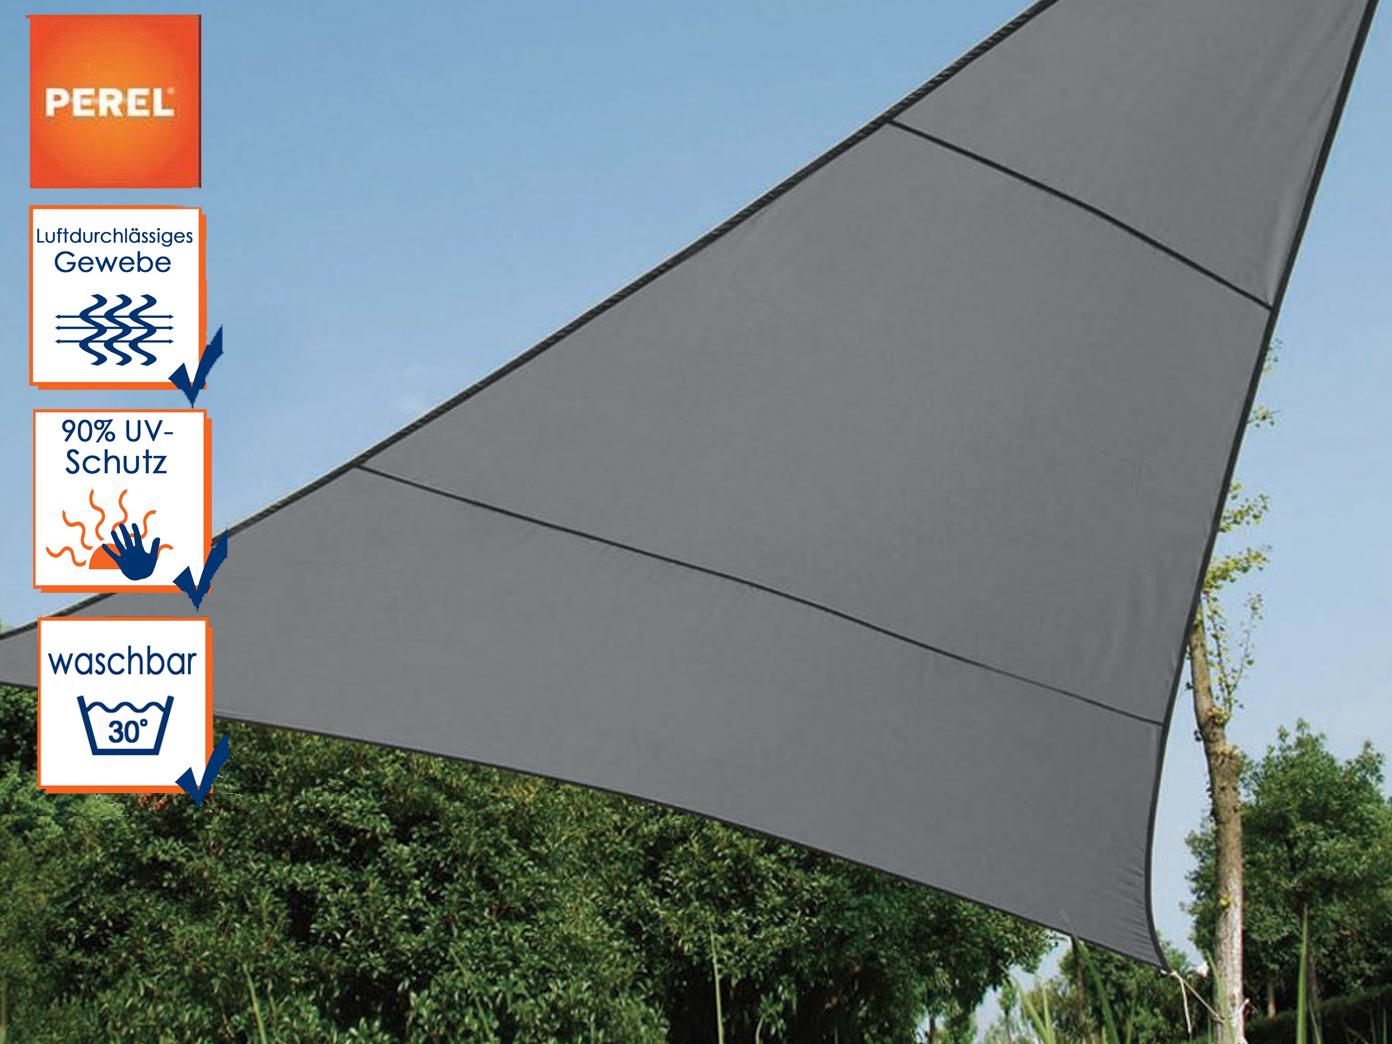 sonnensegel dreieck dunkelgrau 10 8 m sonnenschutz f r. Black Bedroom Furniture Sets. Home Design Ideas